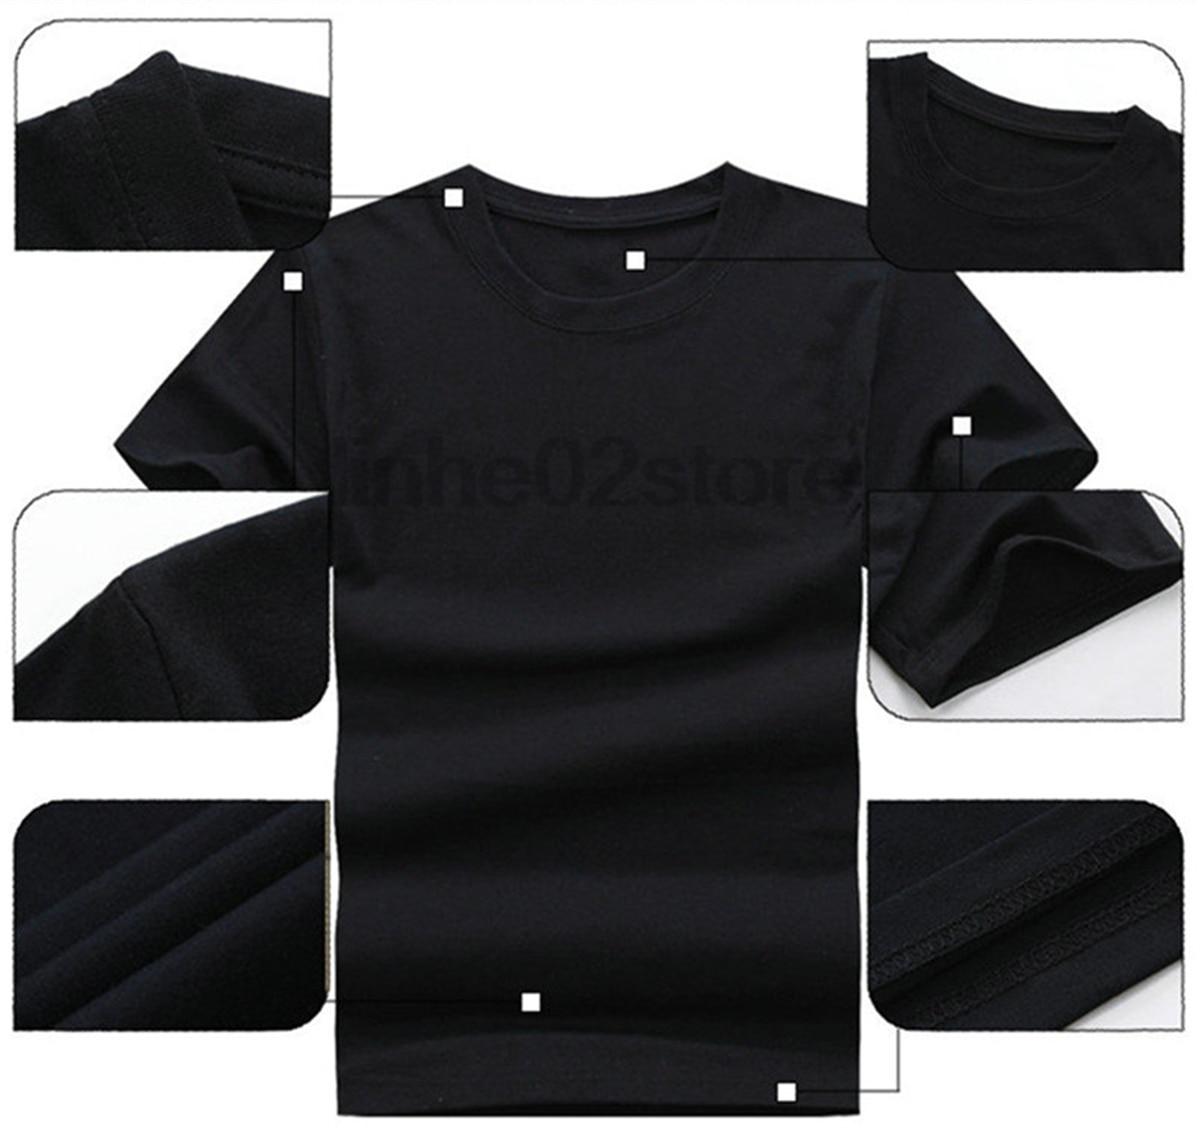 GILDAN Now I Lay Me Down To Sleep Beside My Bed A GUN T-shirt Womens T-shirt Dress female T-shirt